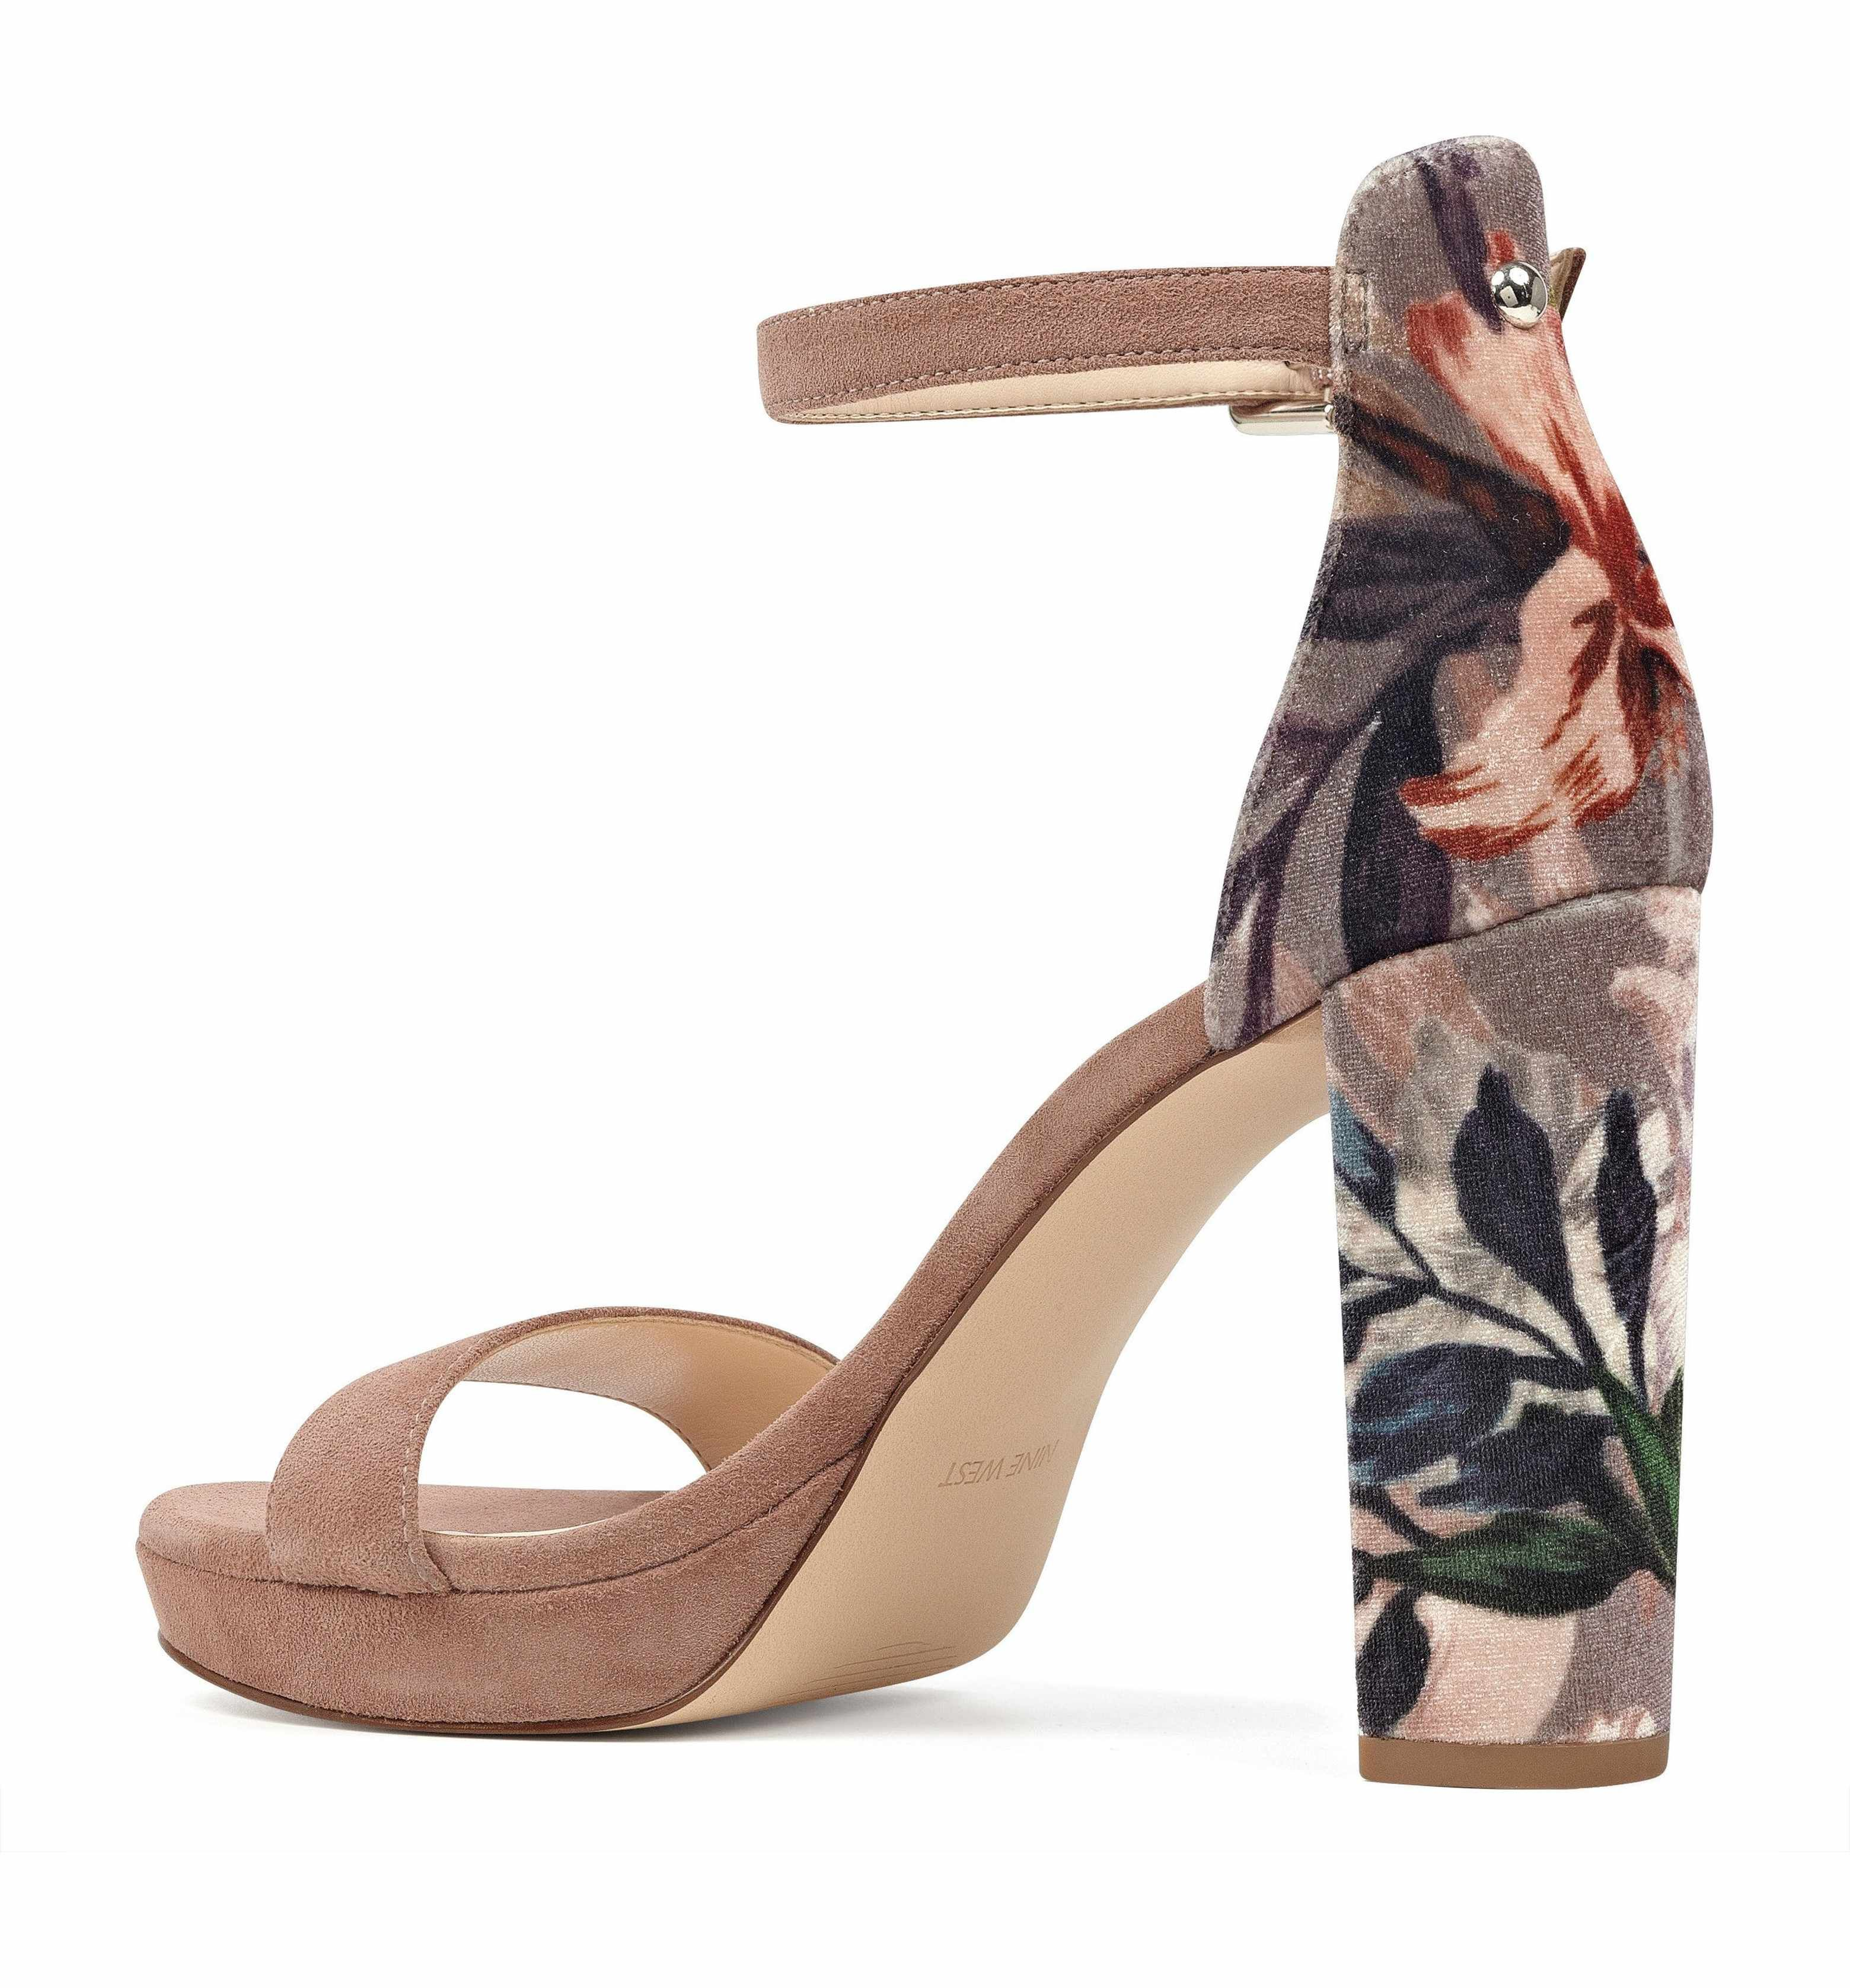 reasonable price available new design Main Image - Nine West Dempsey Platform Sandal (Women ...